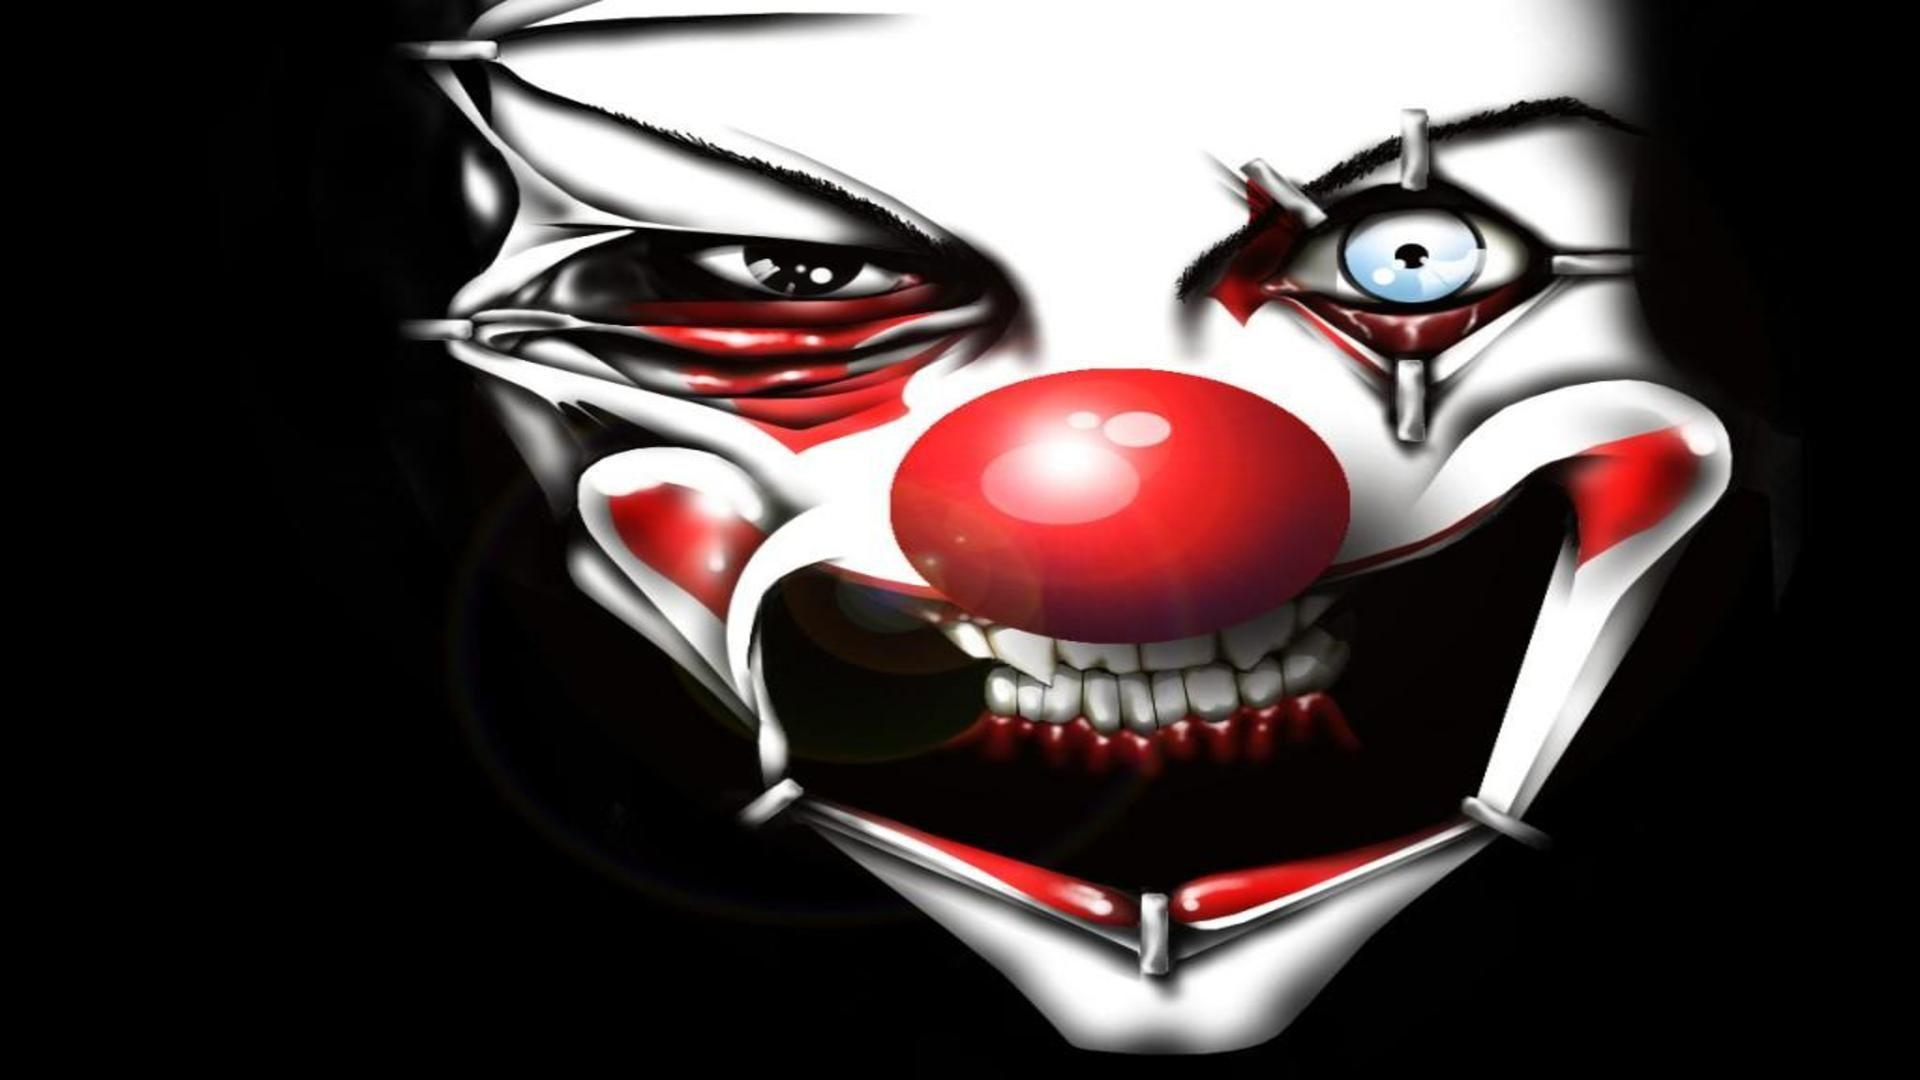 Evil Clown Wallpapers Desktop